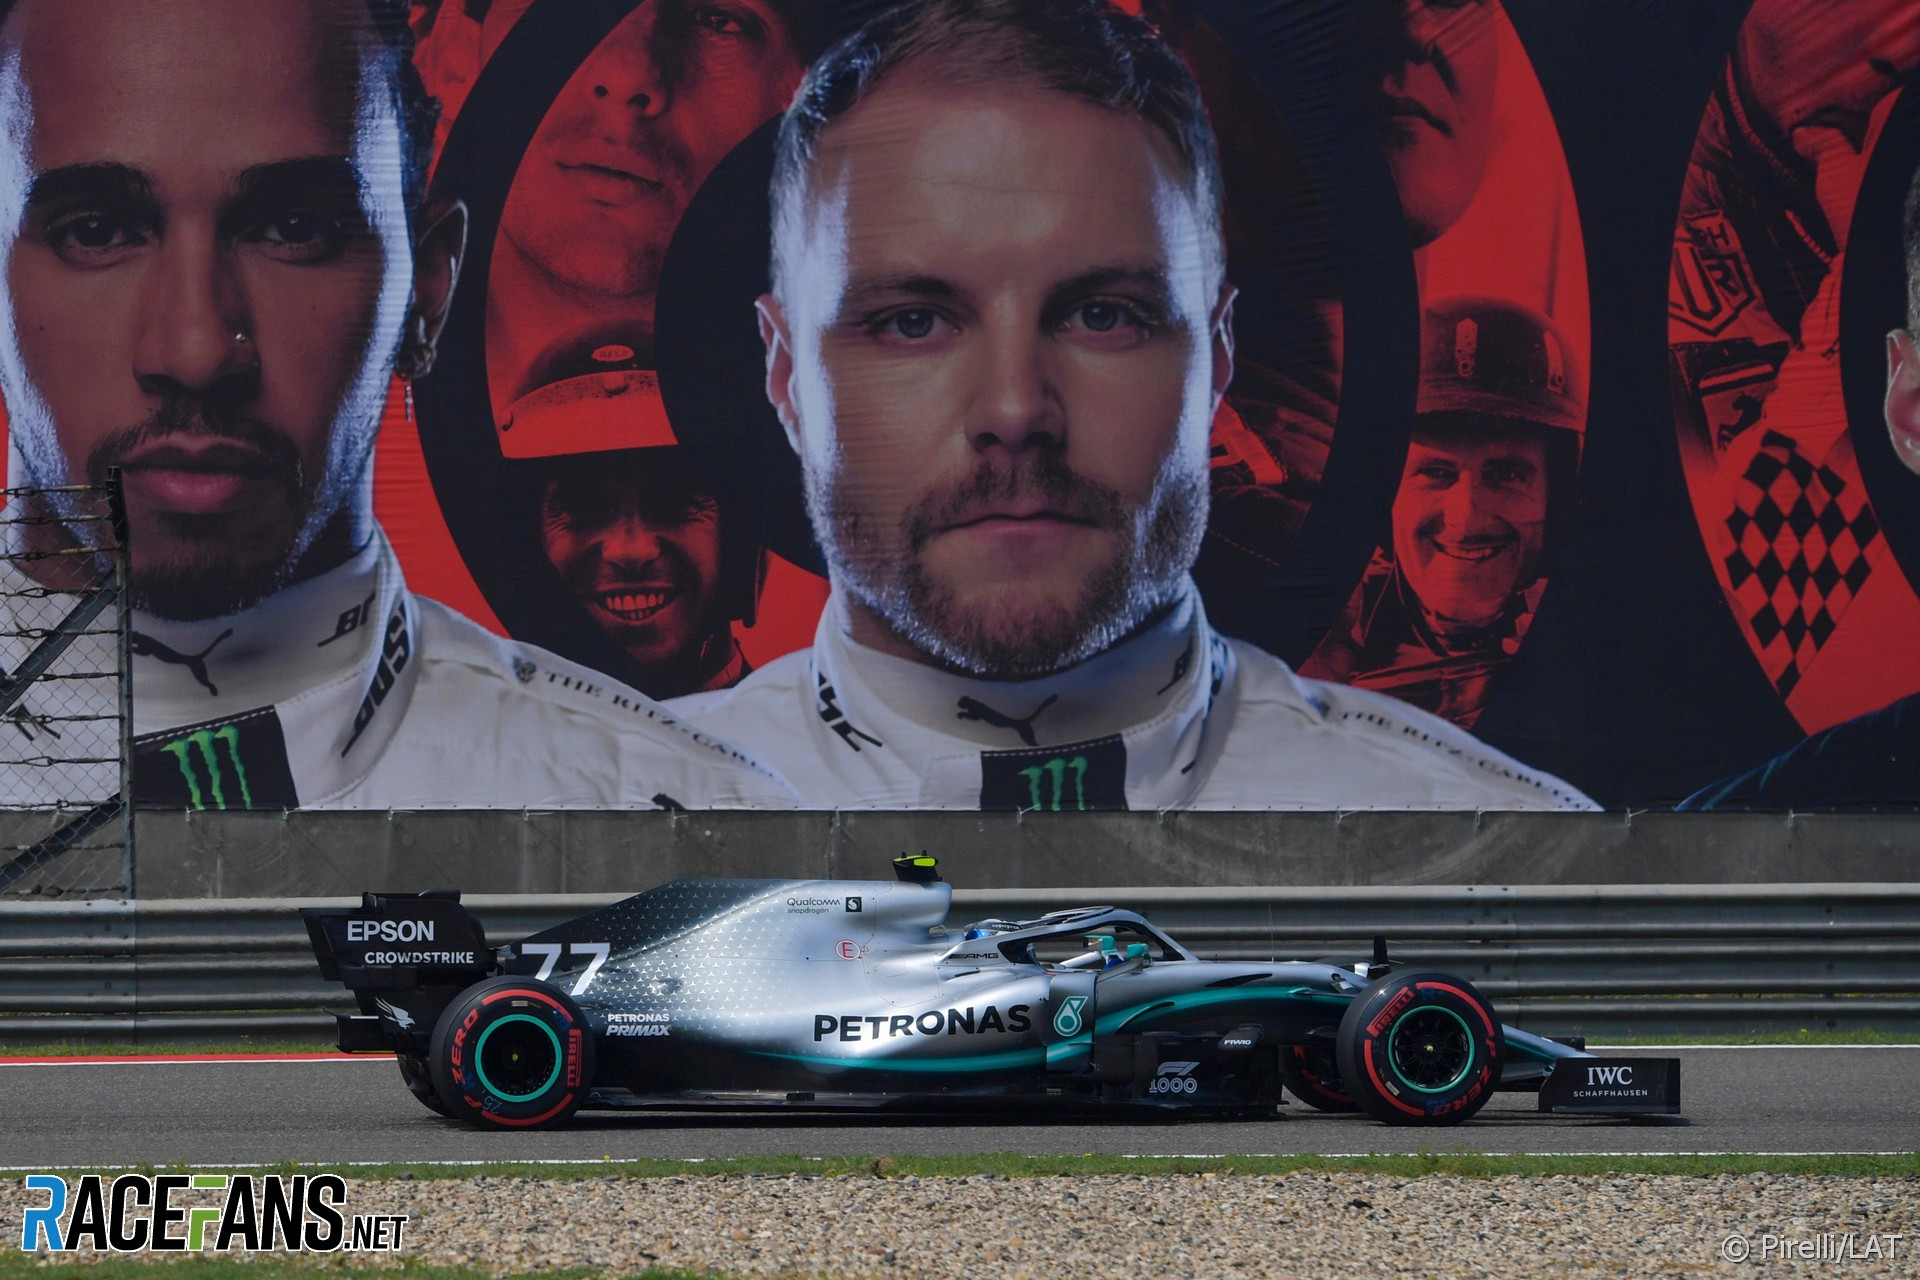 Valtteri Bottas, Mercedes, Shanghai International Circuit, 2019